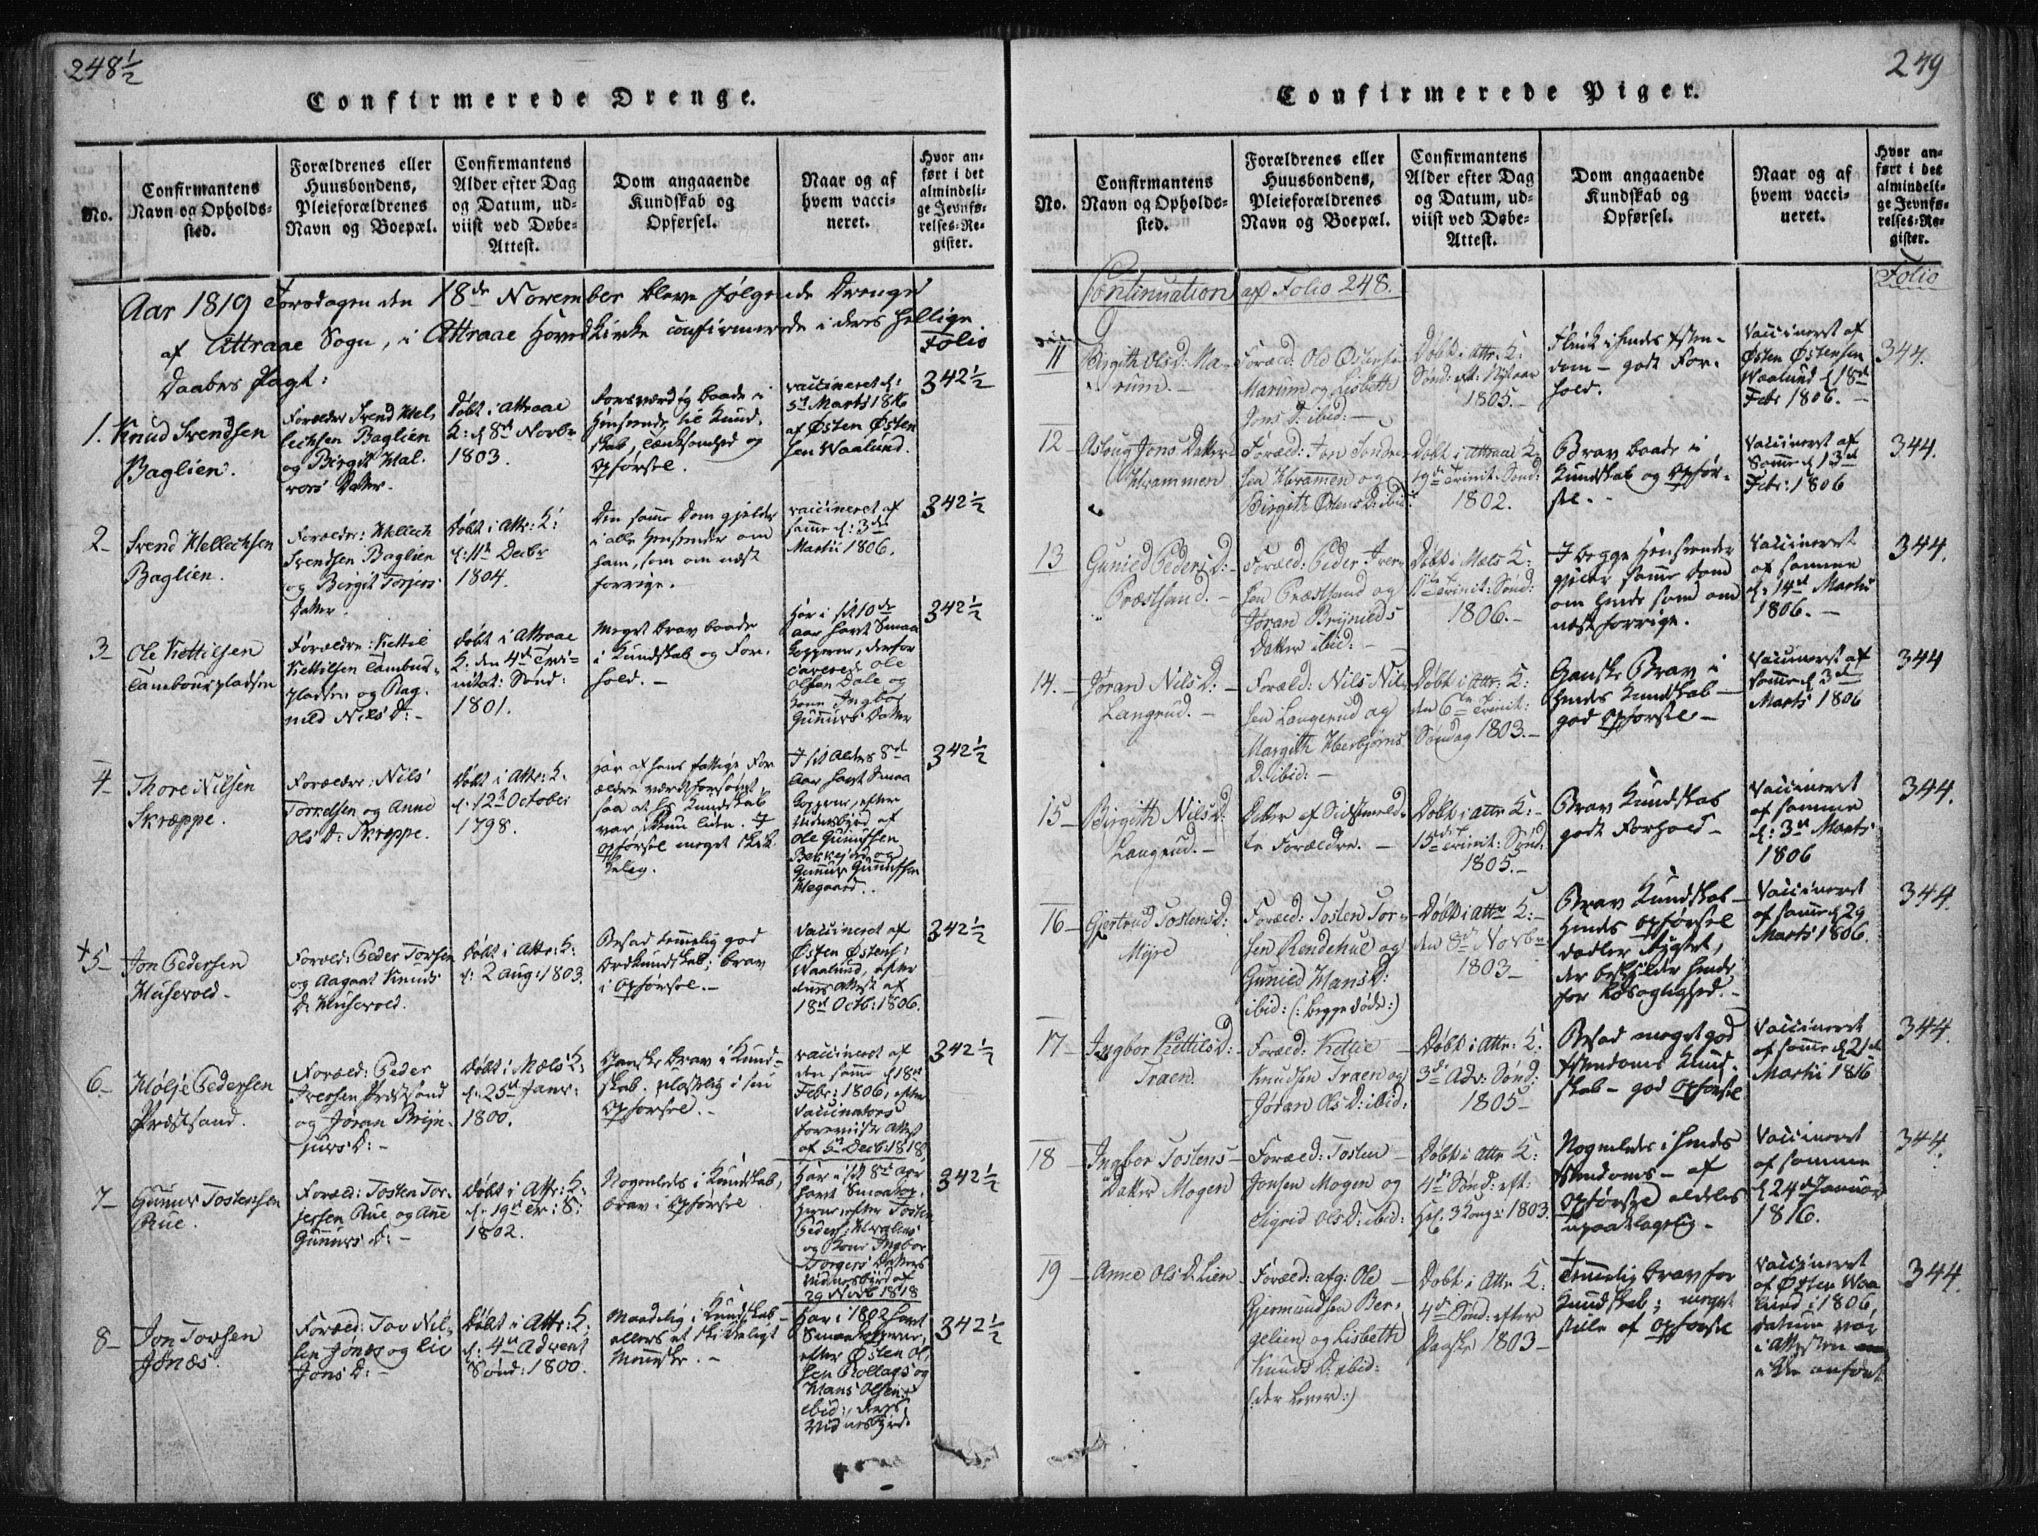 SAKO, Tinn kirkebøker, F/Fa/L0004: Ministerialbok nr. I 4, 1815-1843, s. 249